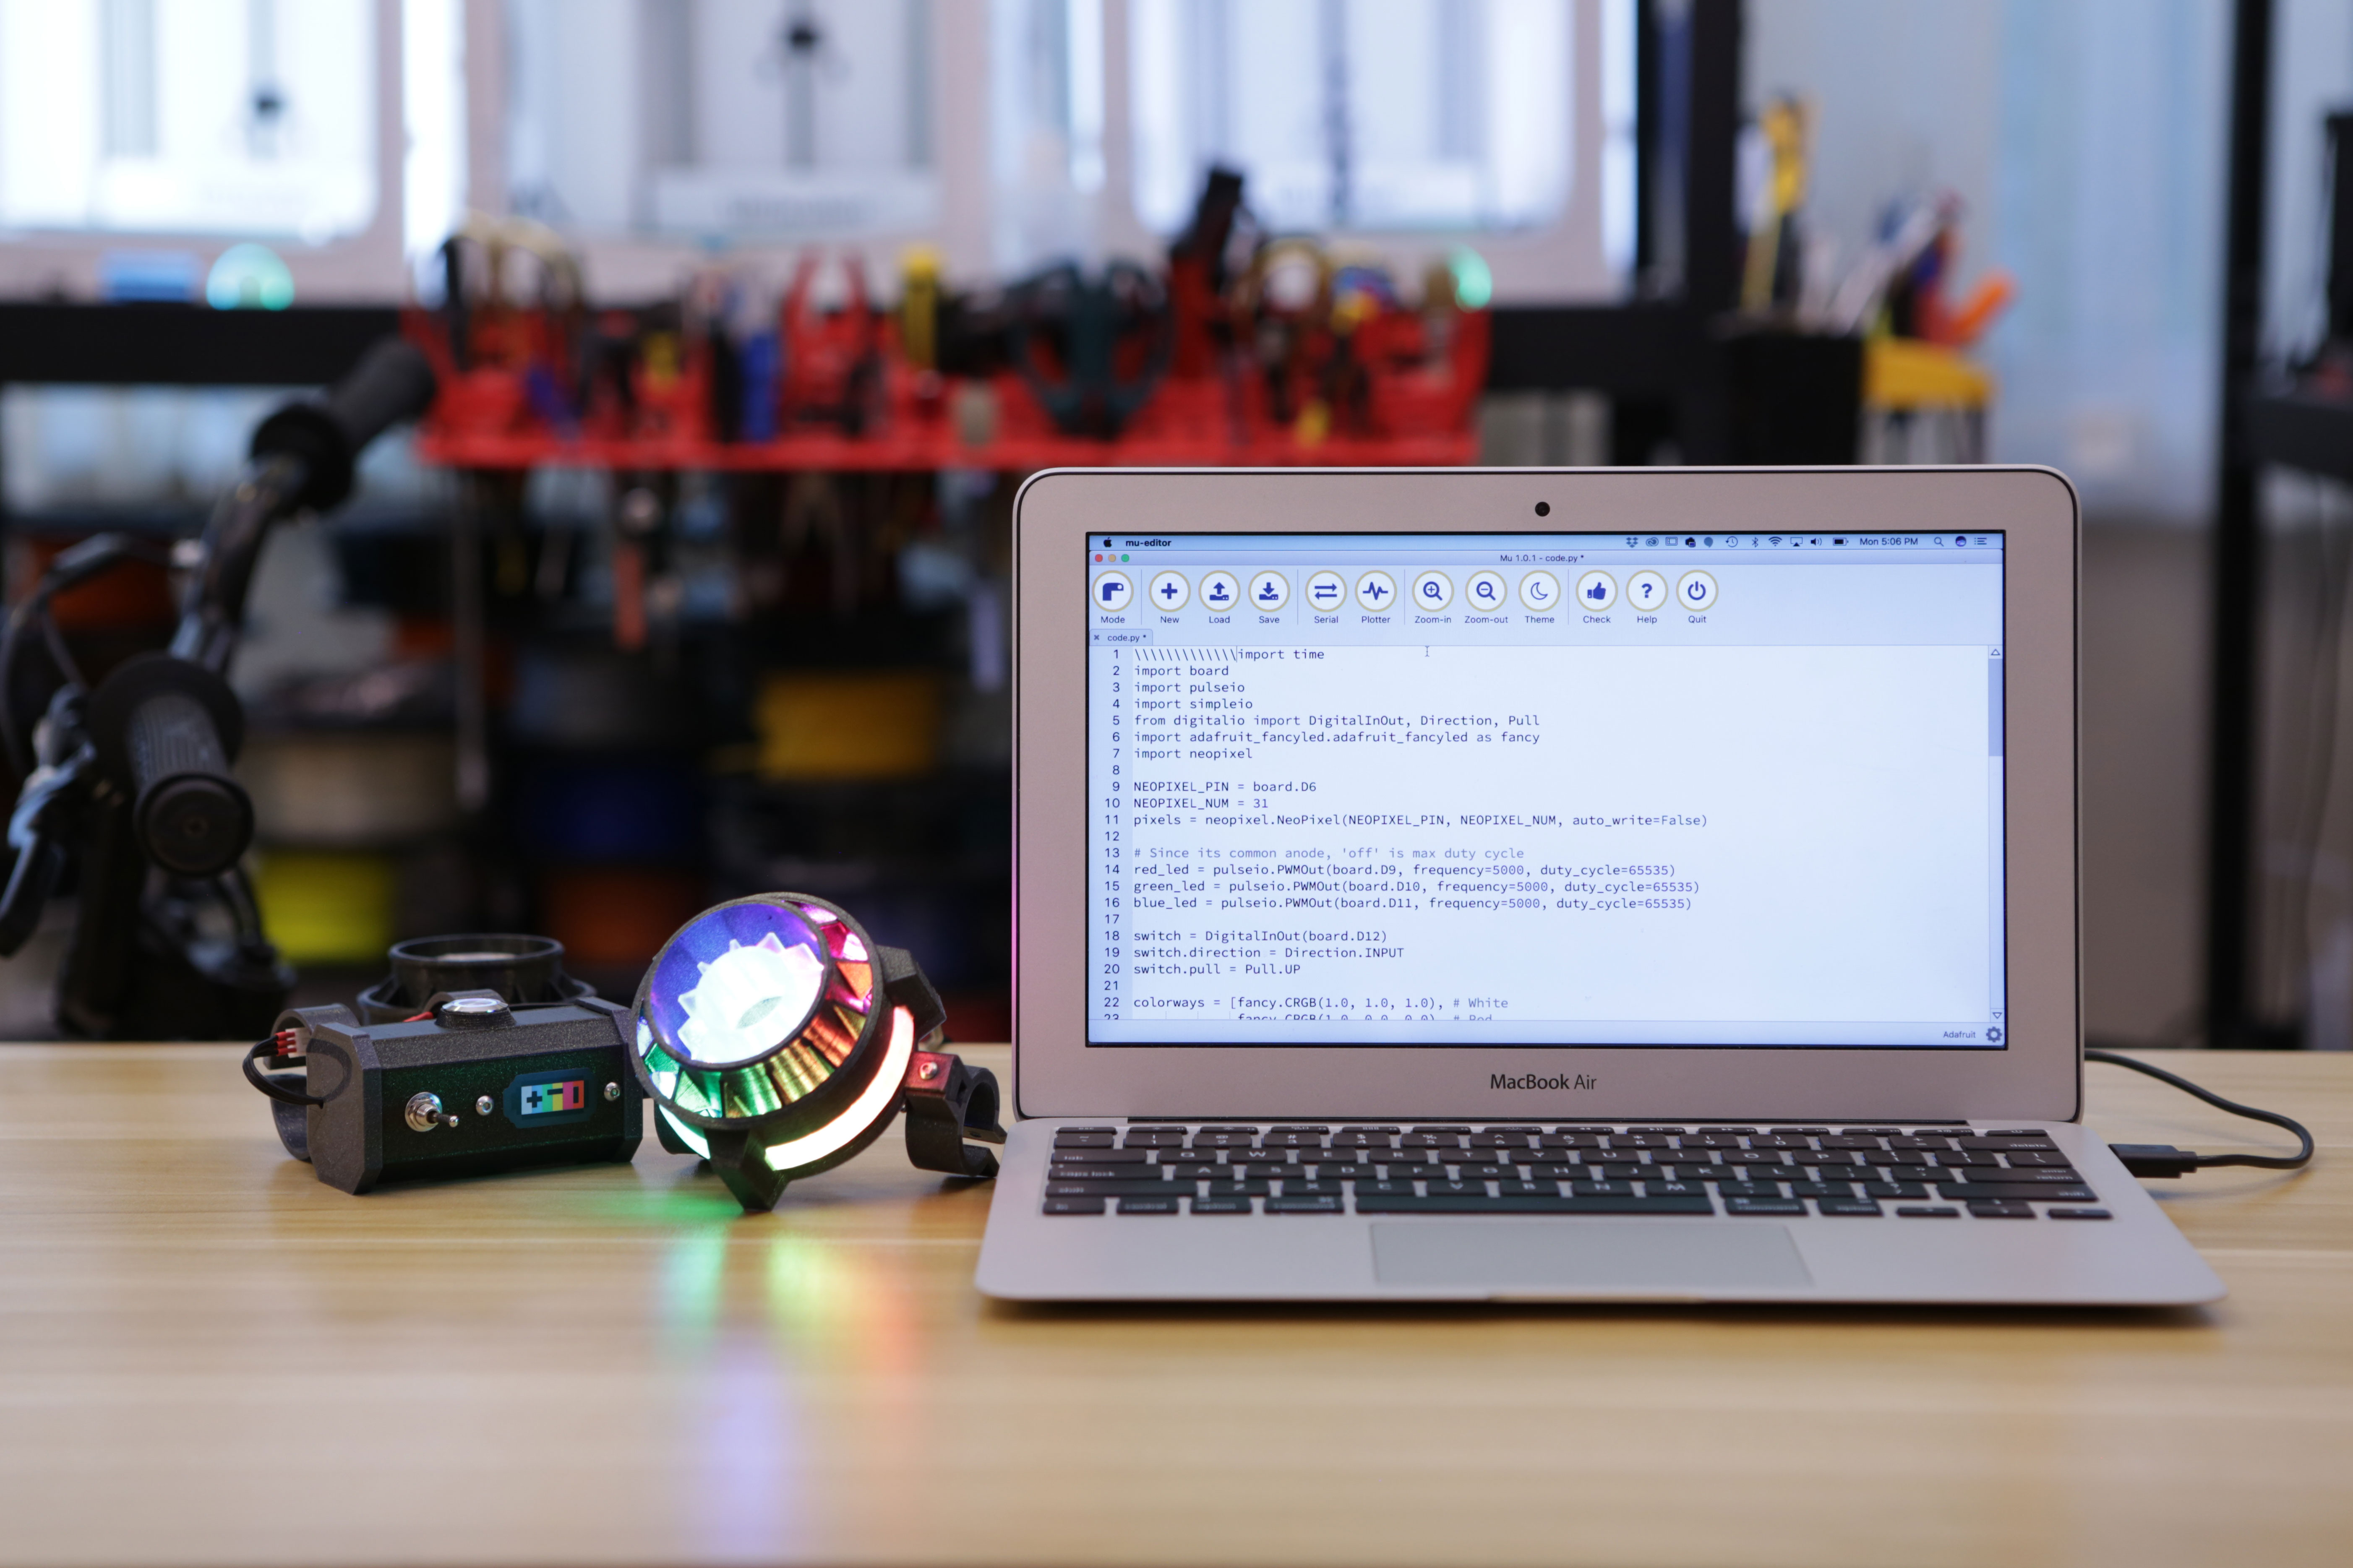 leds_python-laptop.jpg